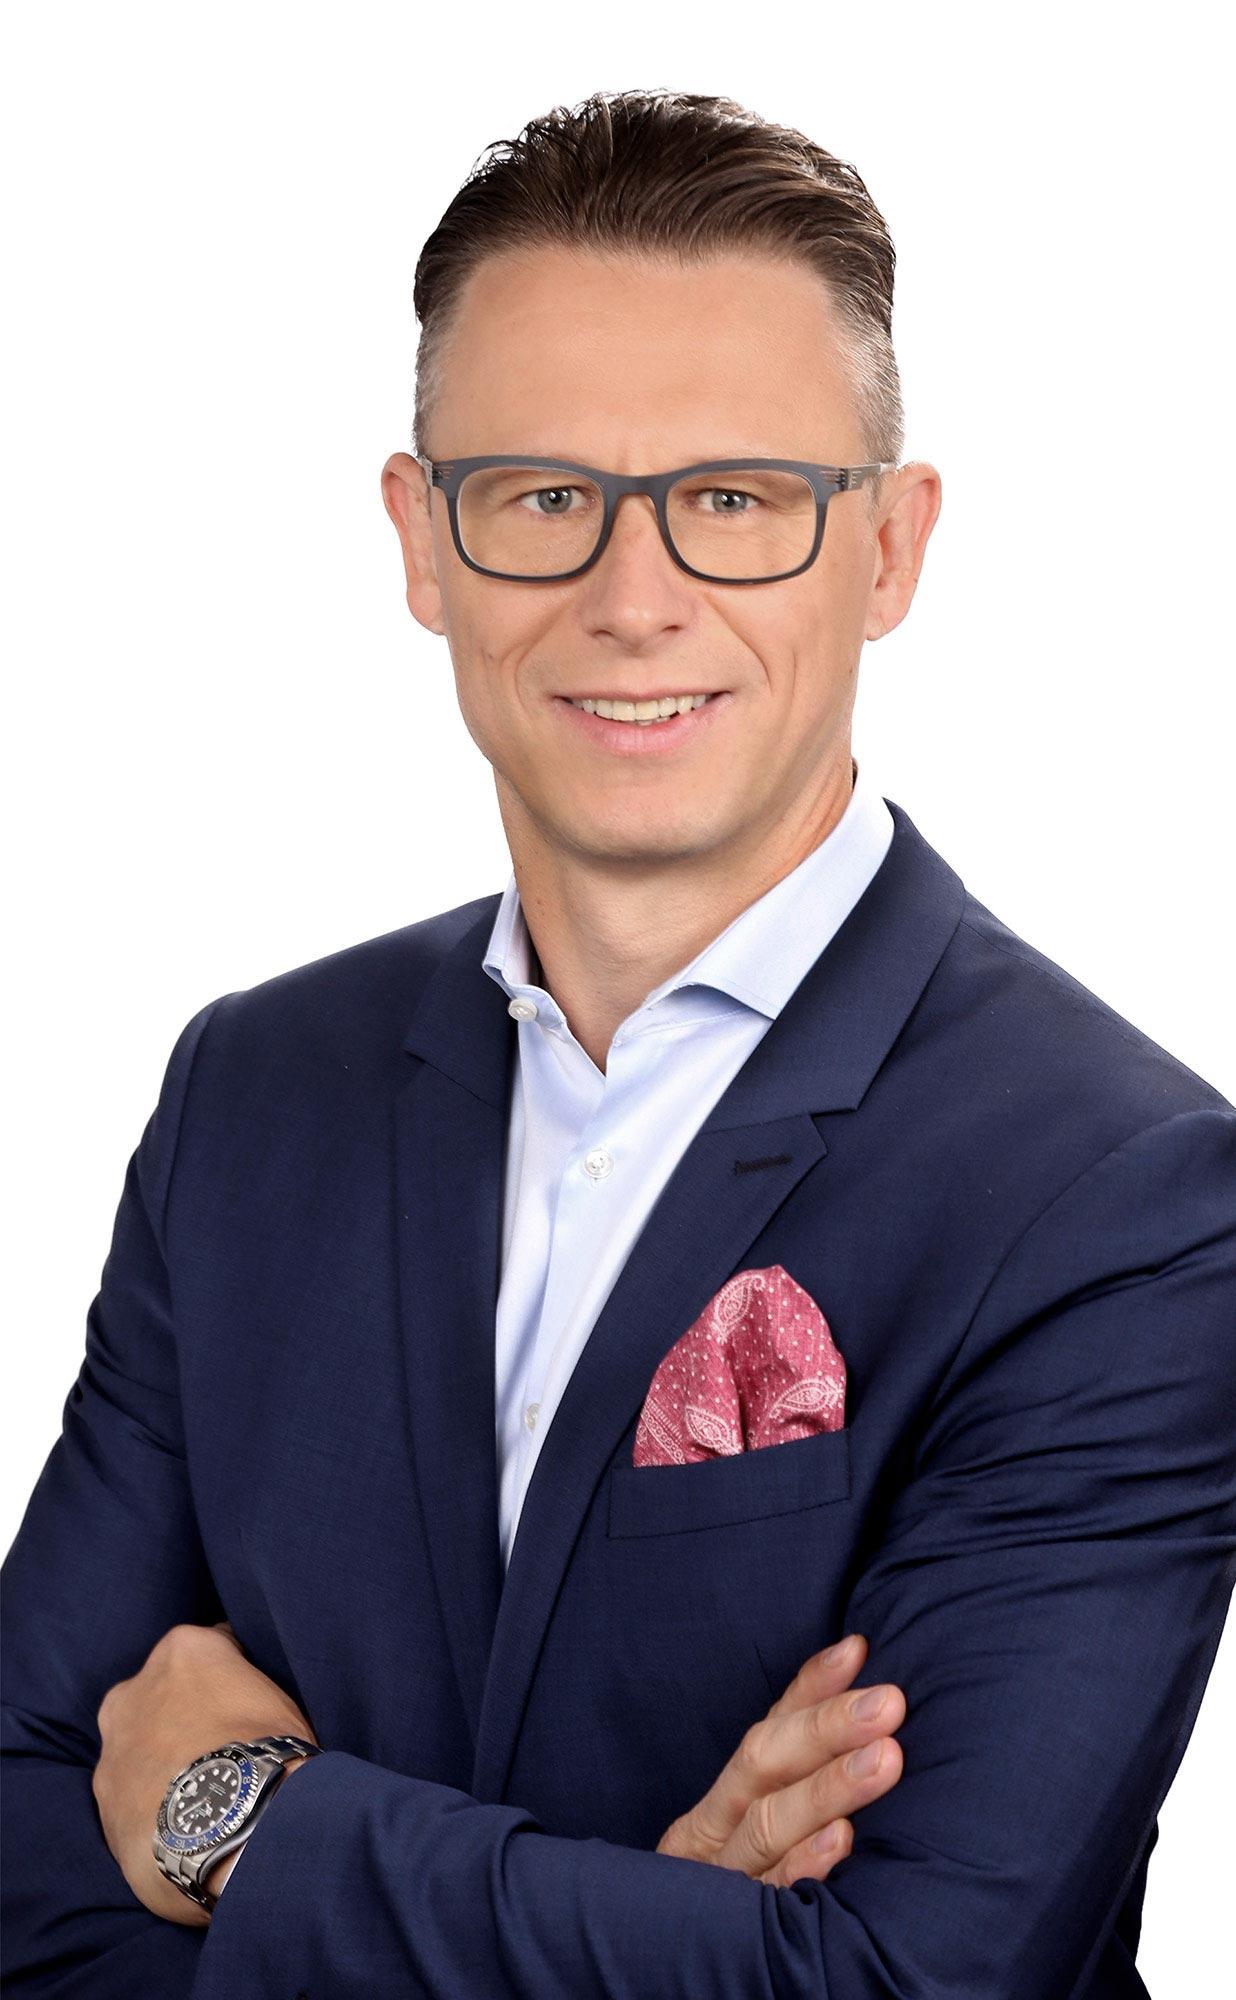 Dean Vukovic - Geschäftsführer V&V Immobilien GmbH - Frankfurt Immobilienmakler